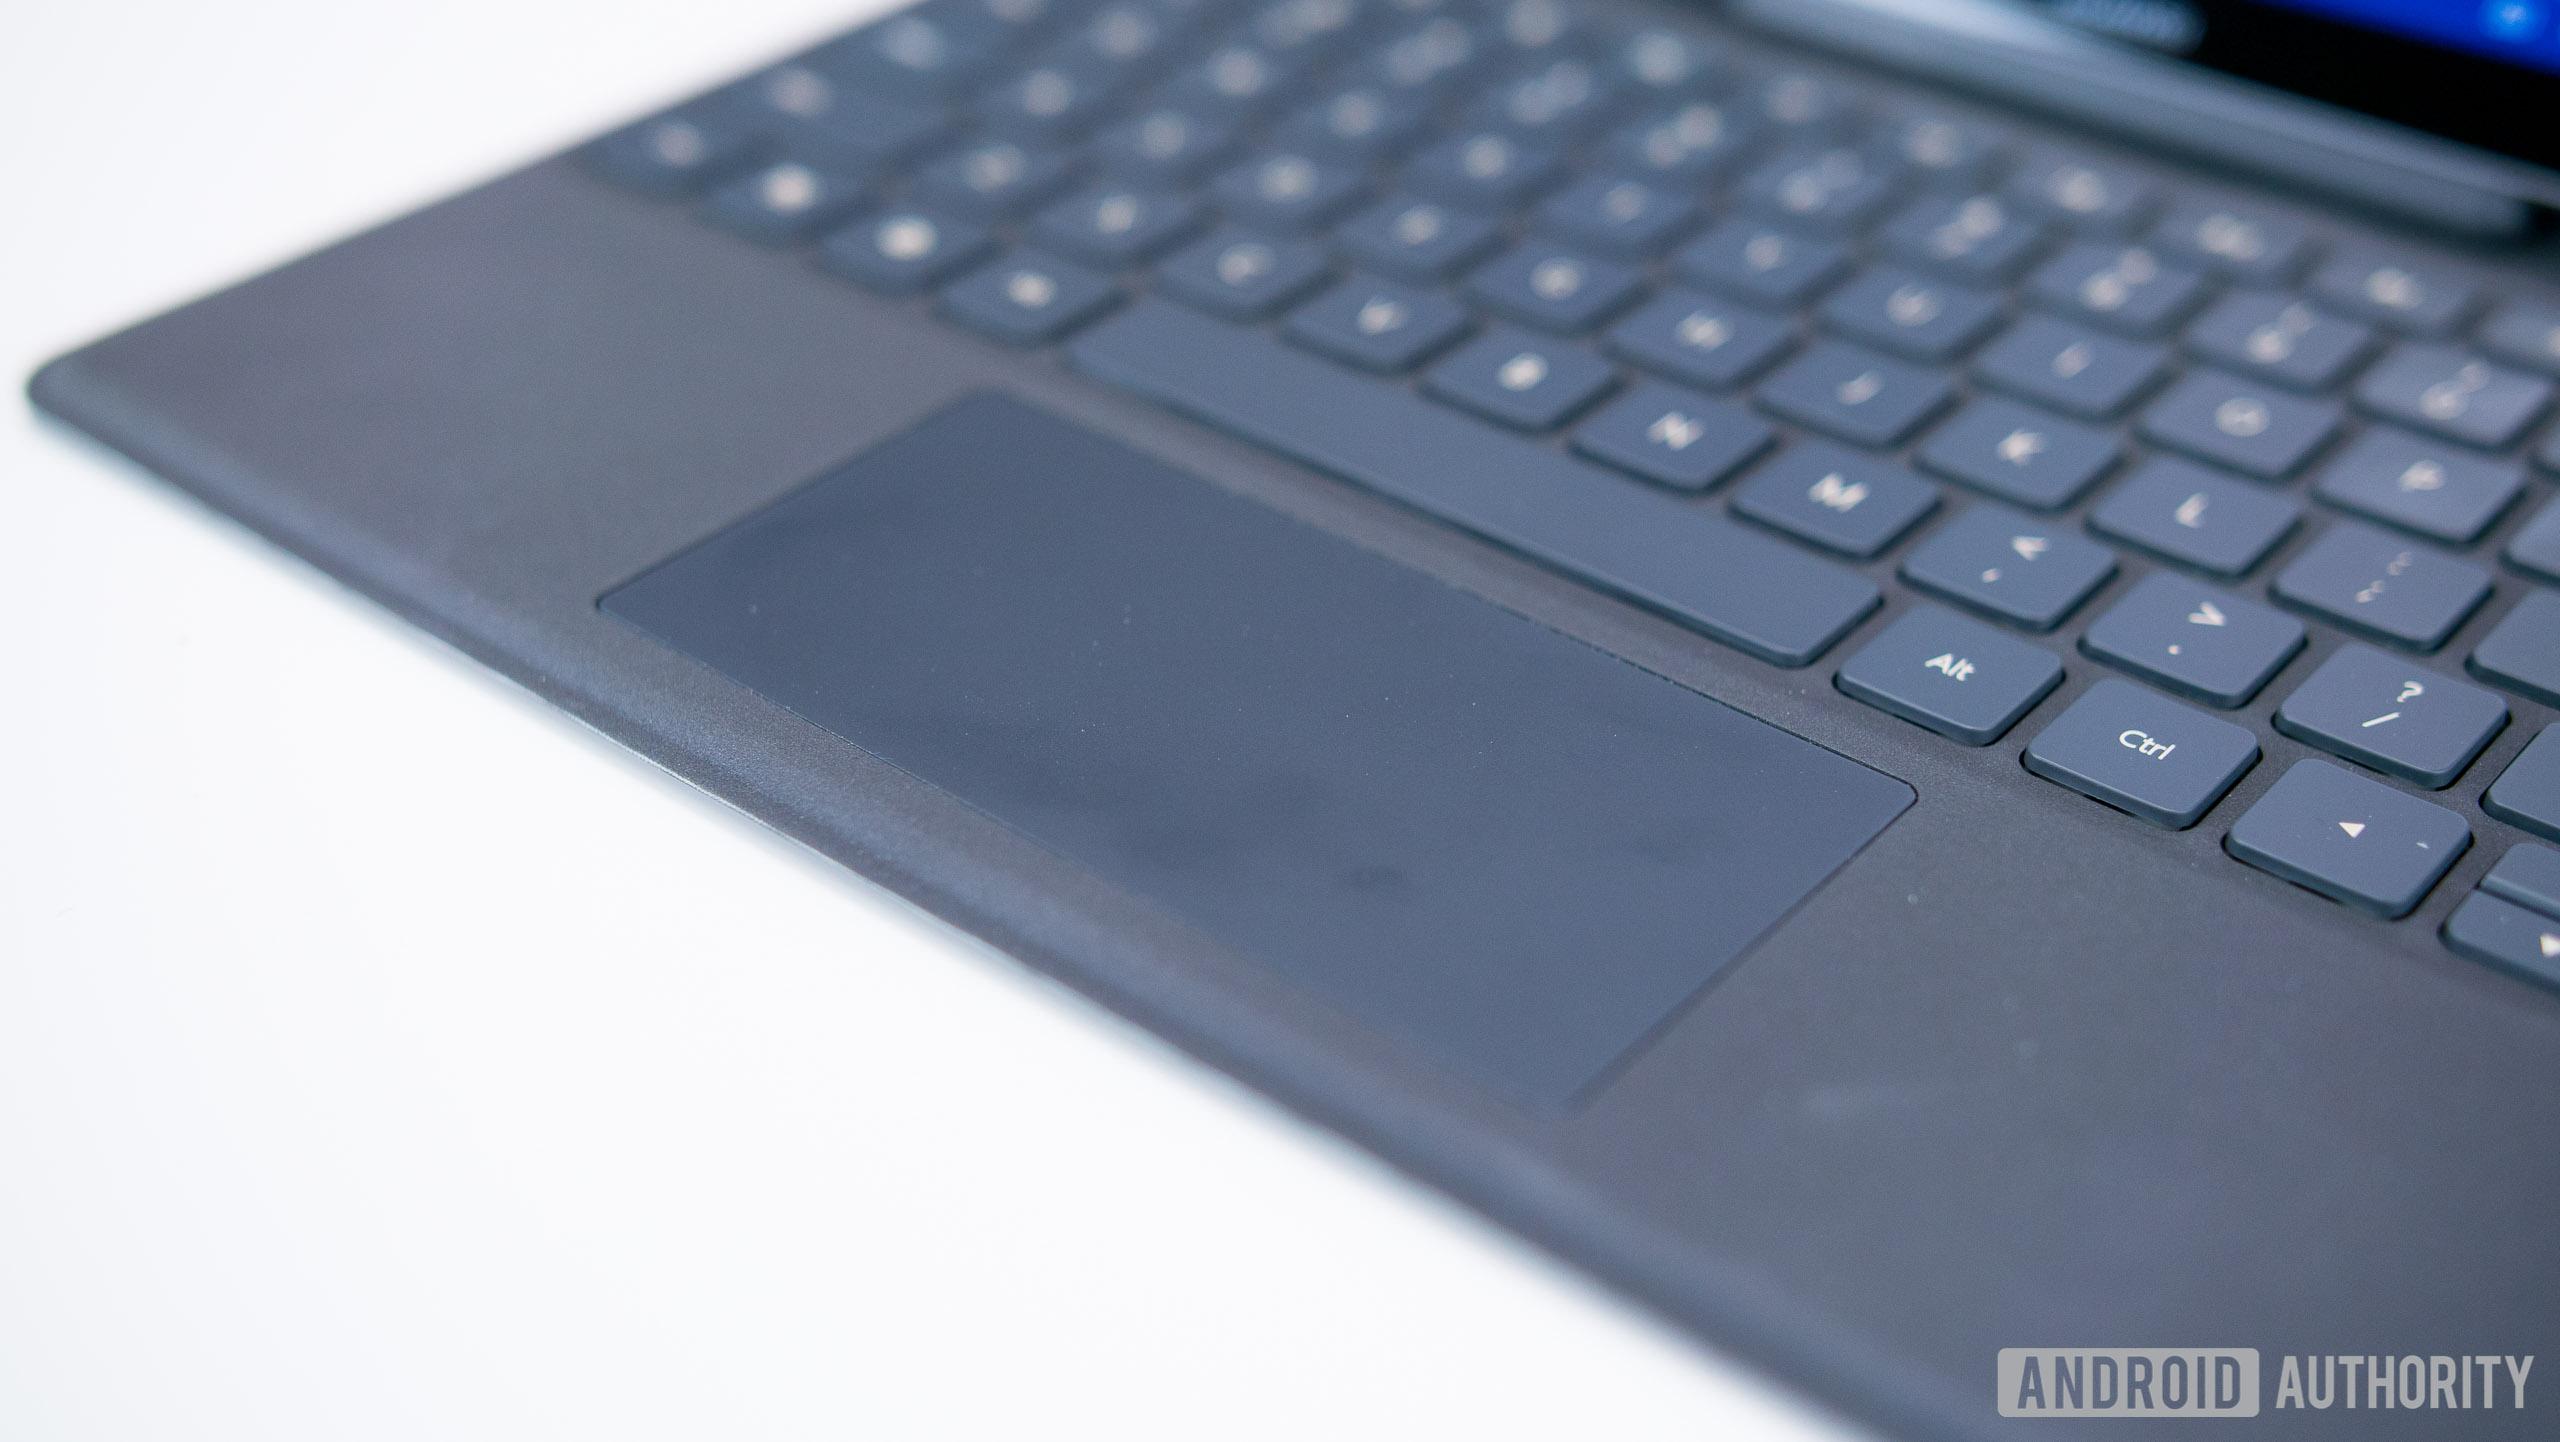 MediaPad M5 MediaPad M5 Pro - Huawei tablets